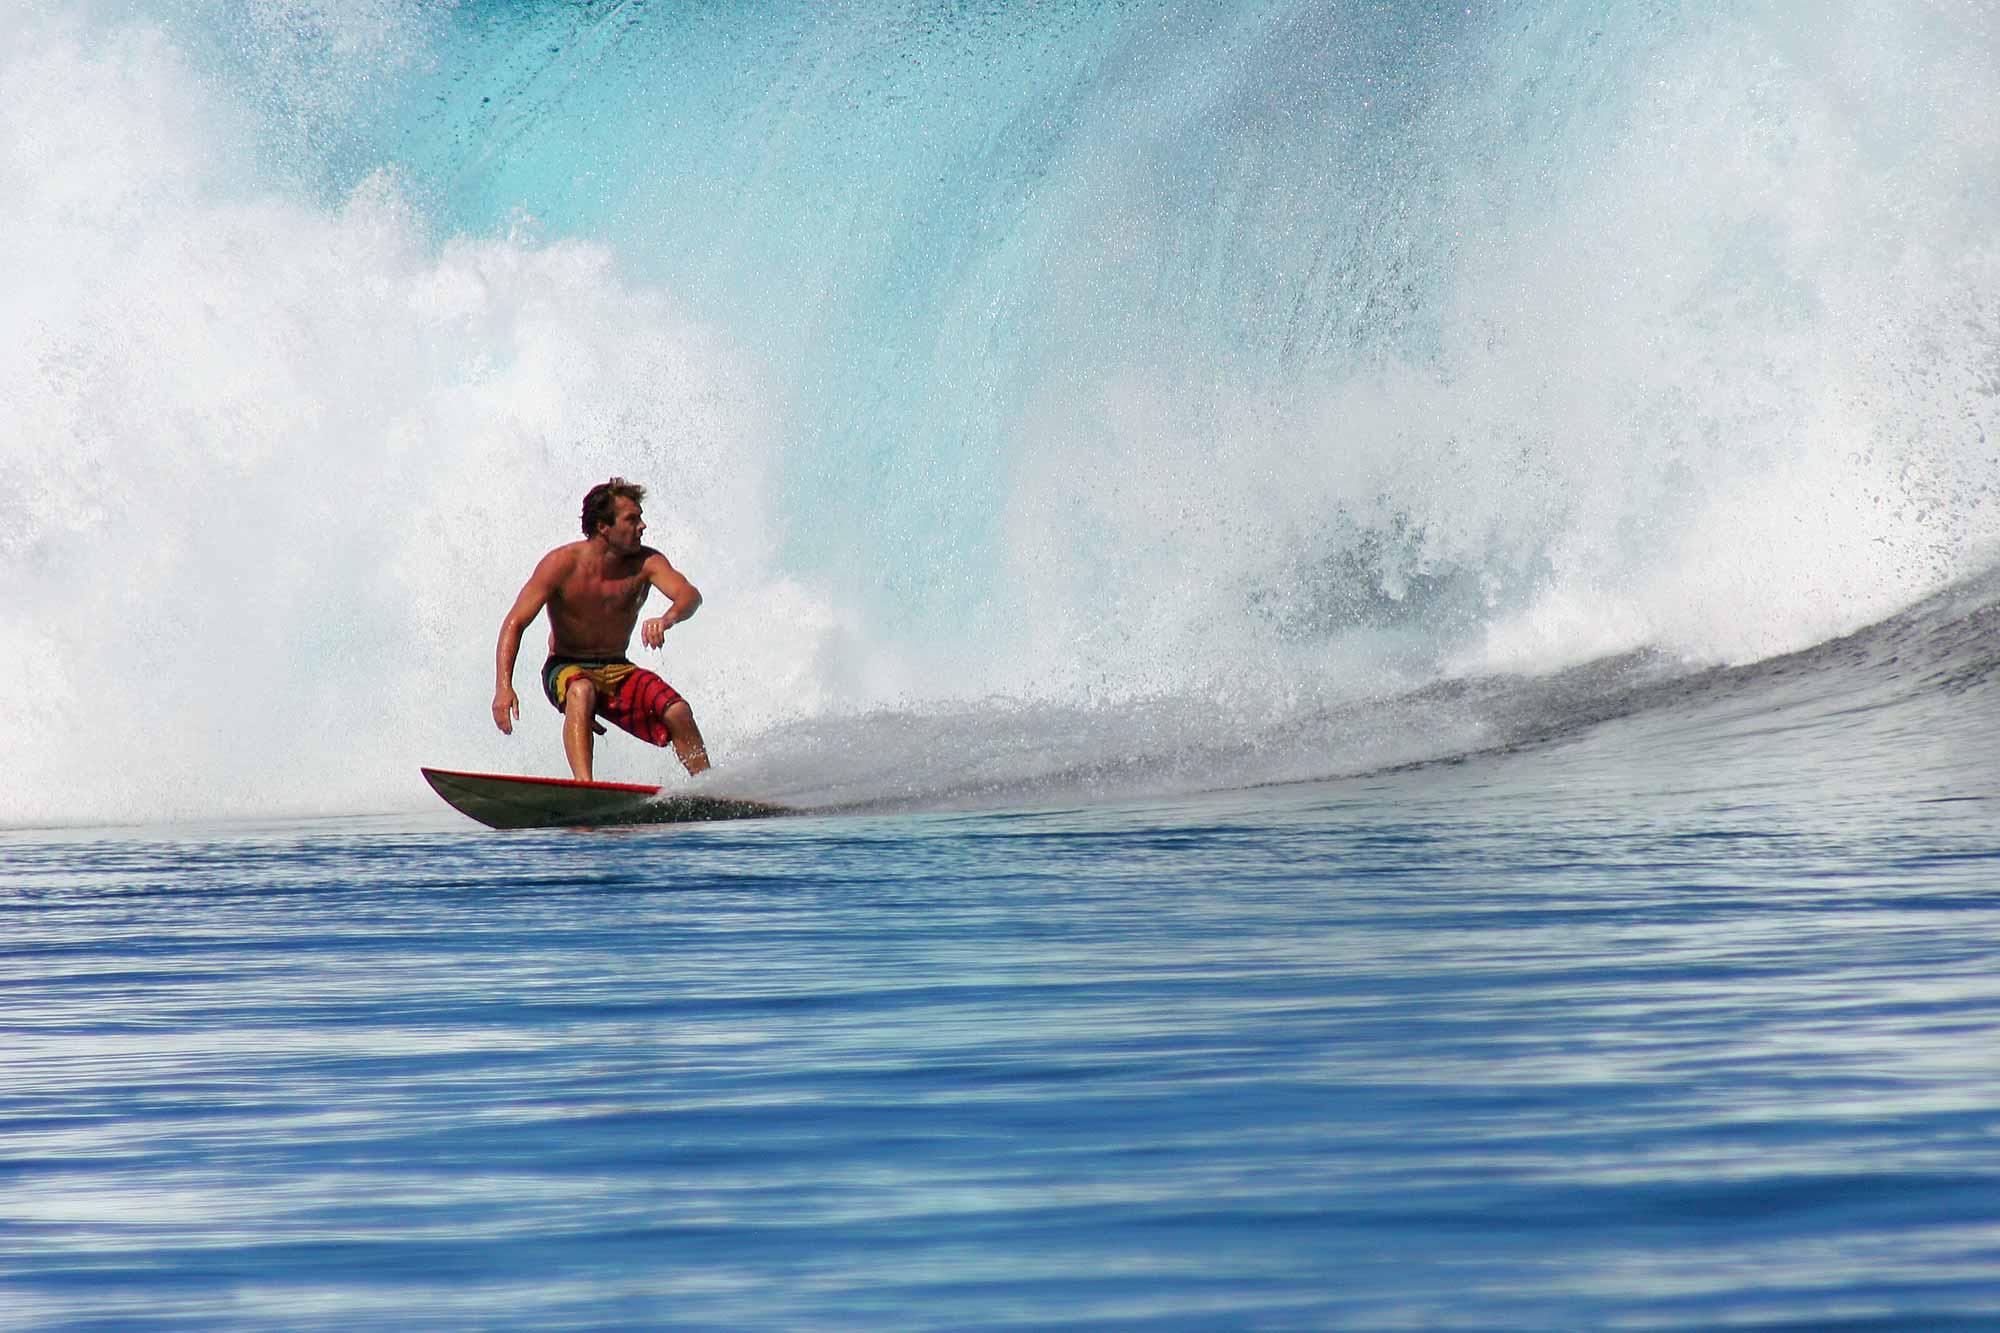 surfing-teahupoo-tahiti-frenchpolynesia-5